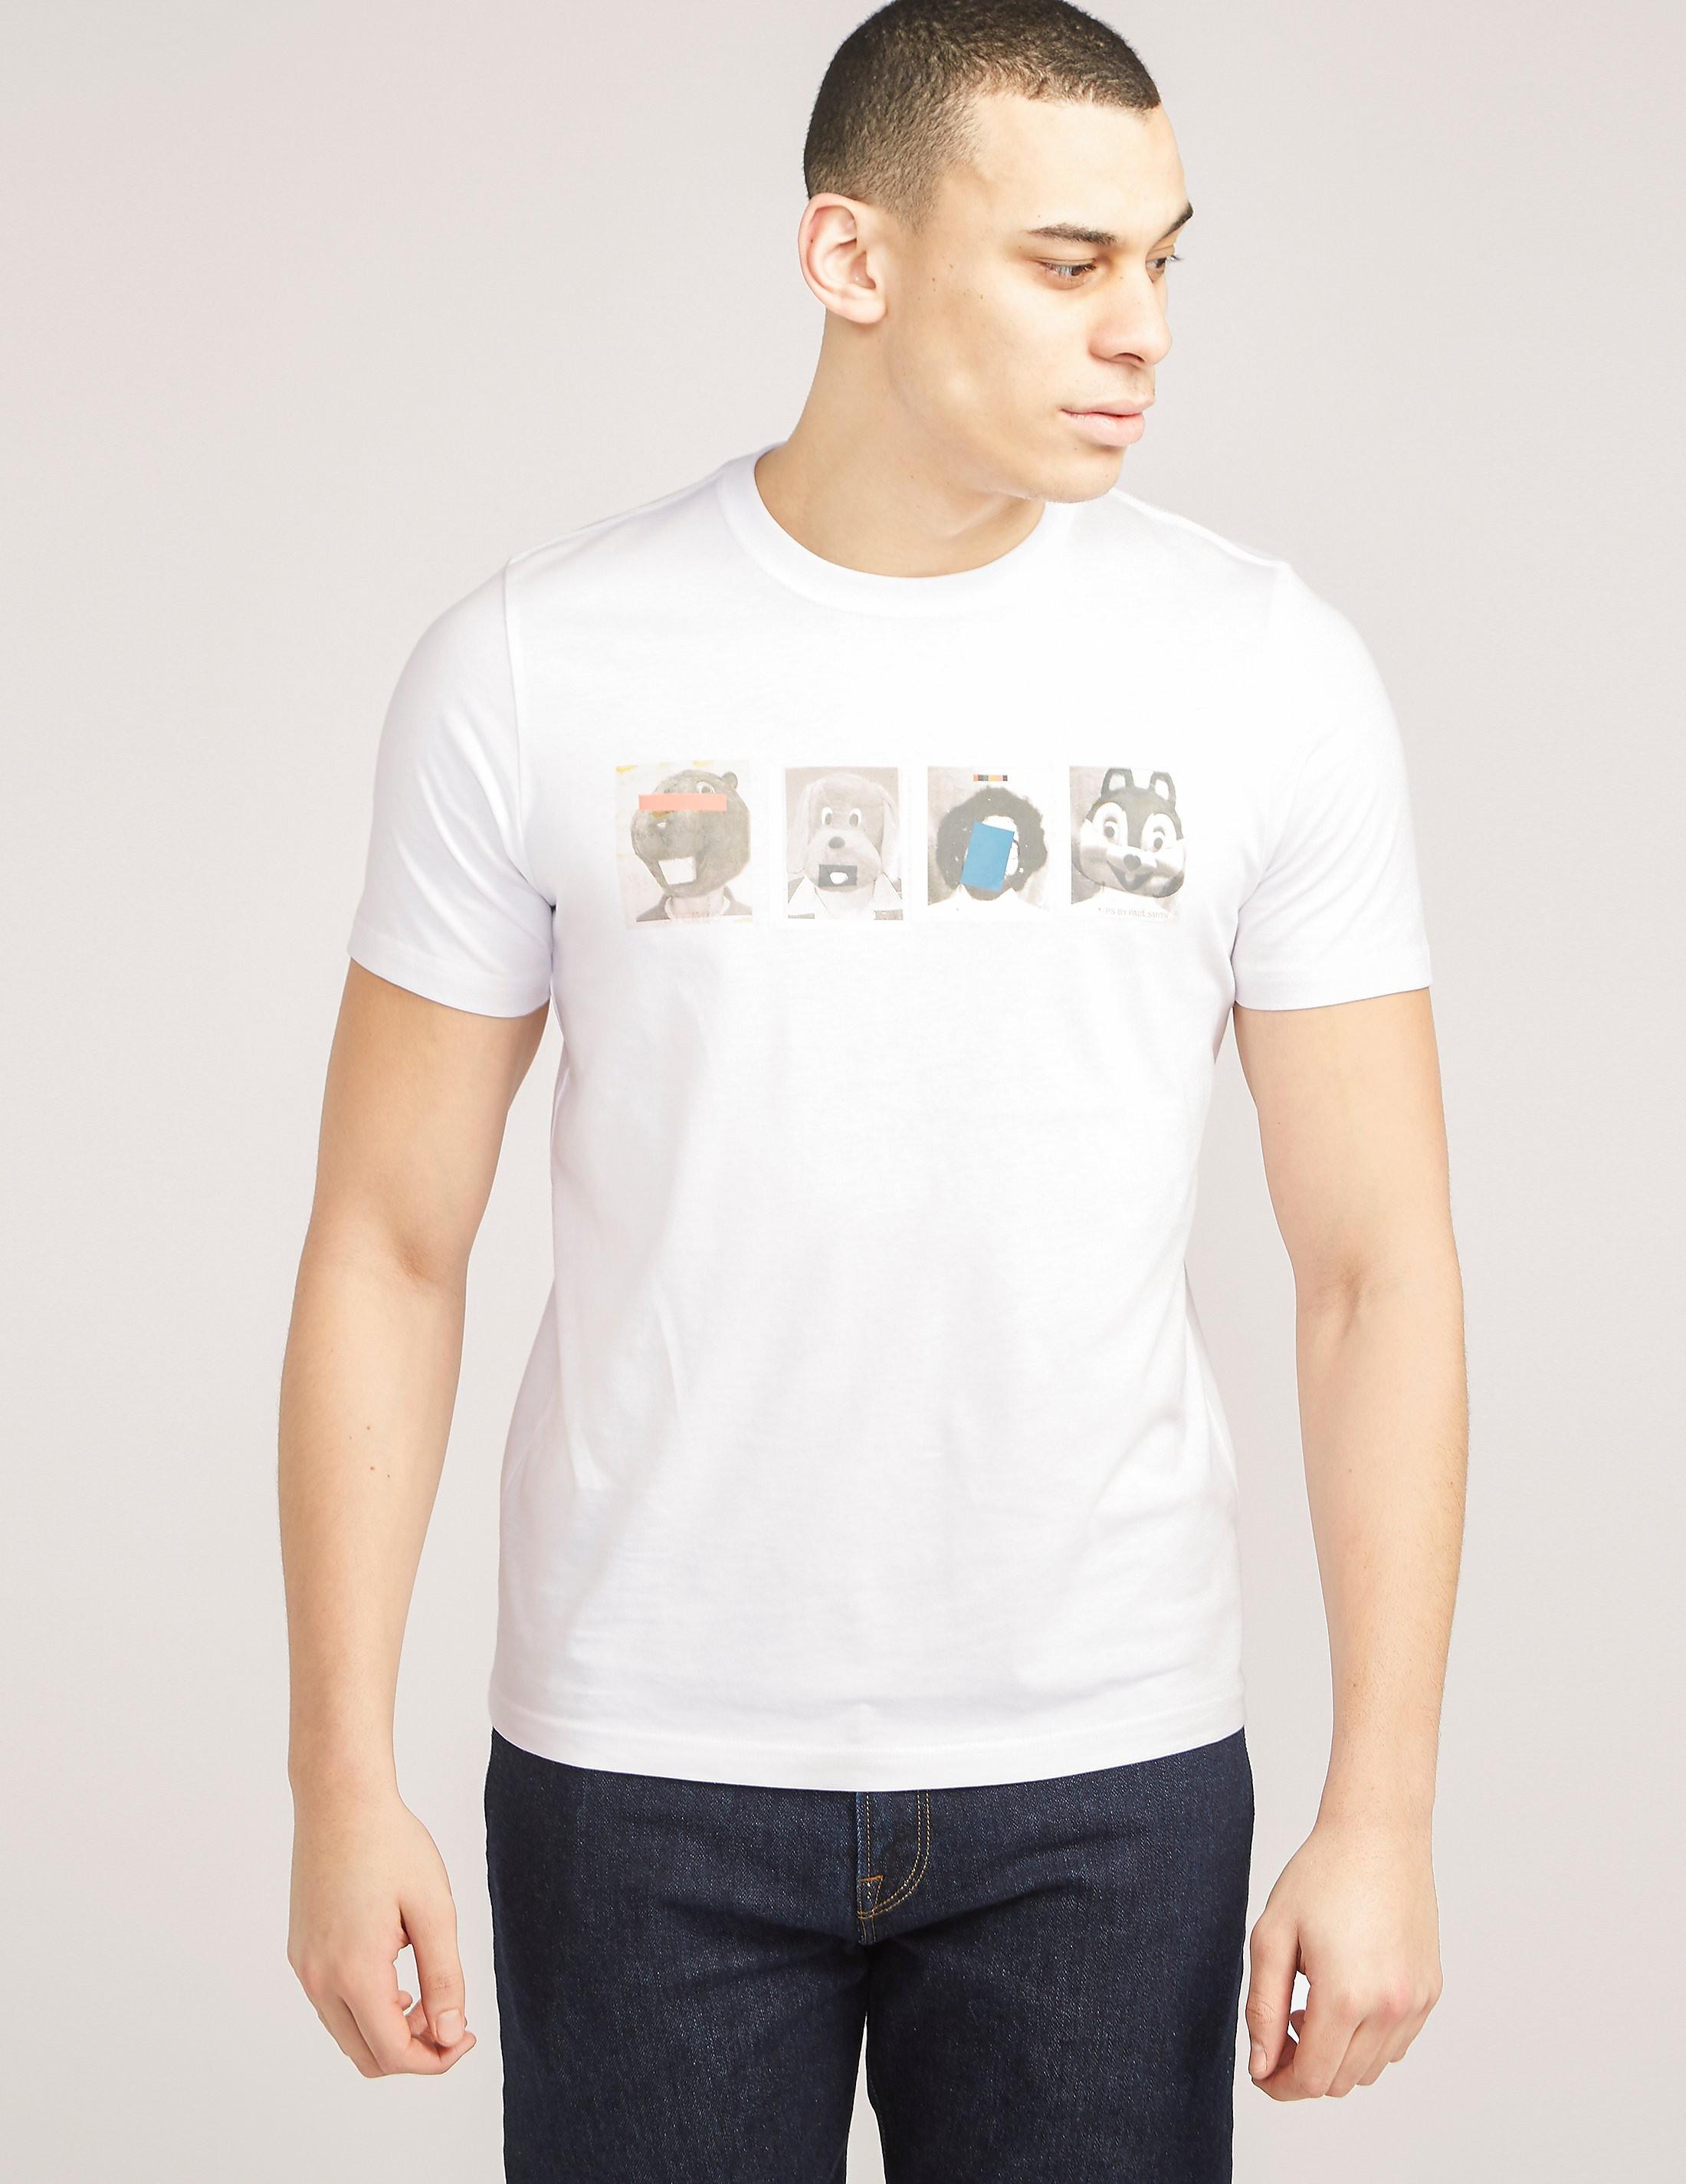 Paul Smith Mascots Print T-Shirt